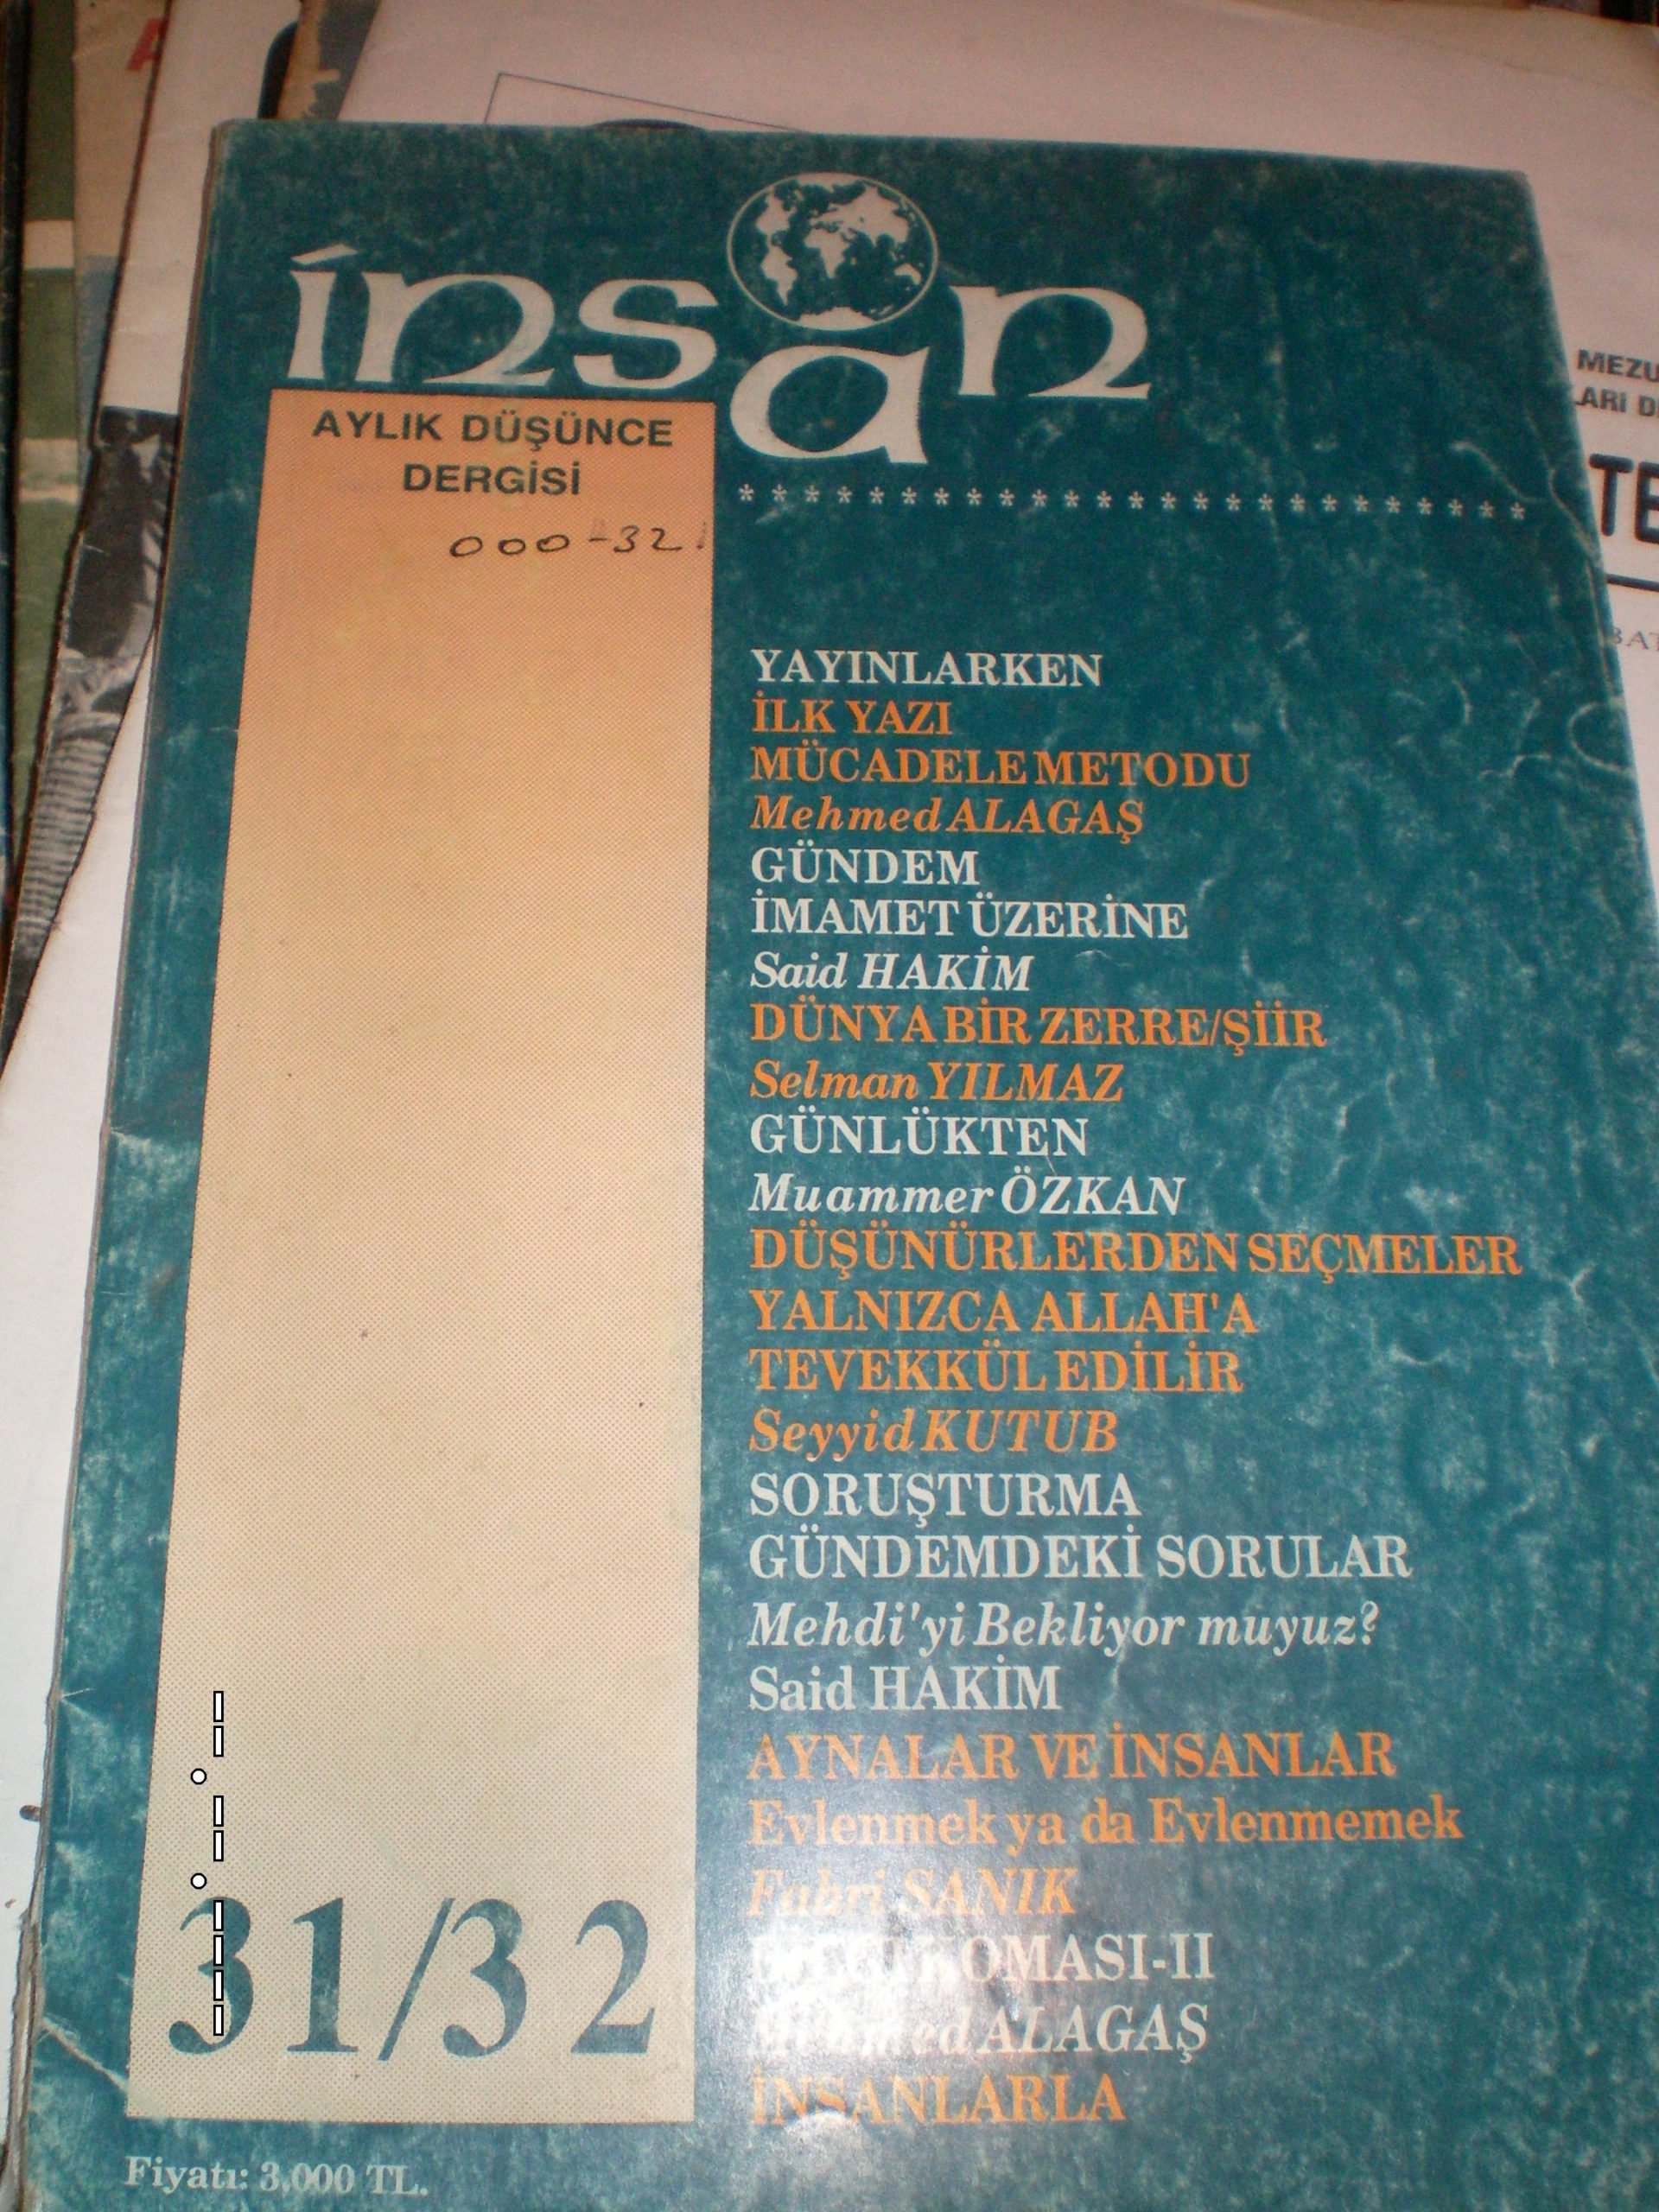 İNSAN(Aylık düşünce dergisi) 1adet s31-32/ 5 TL